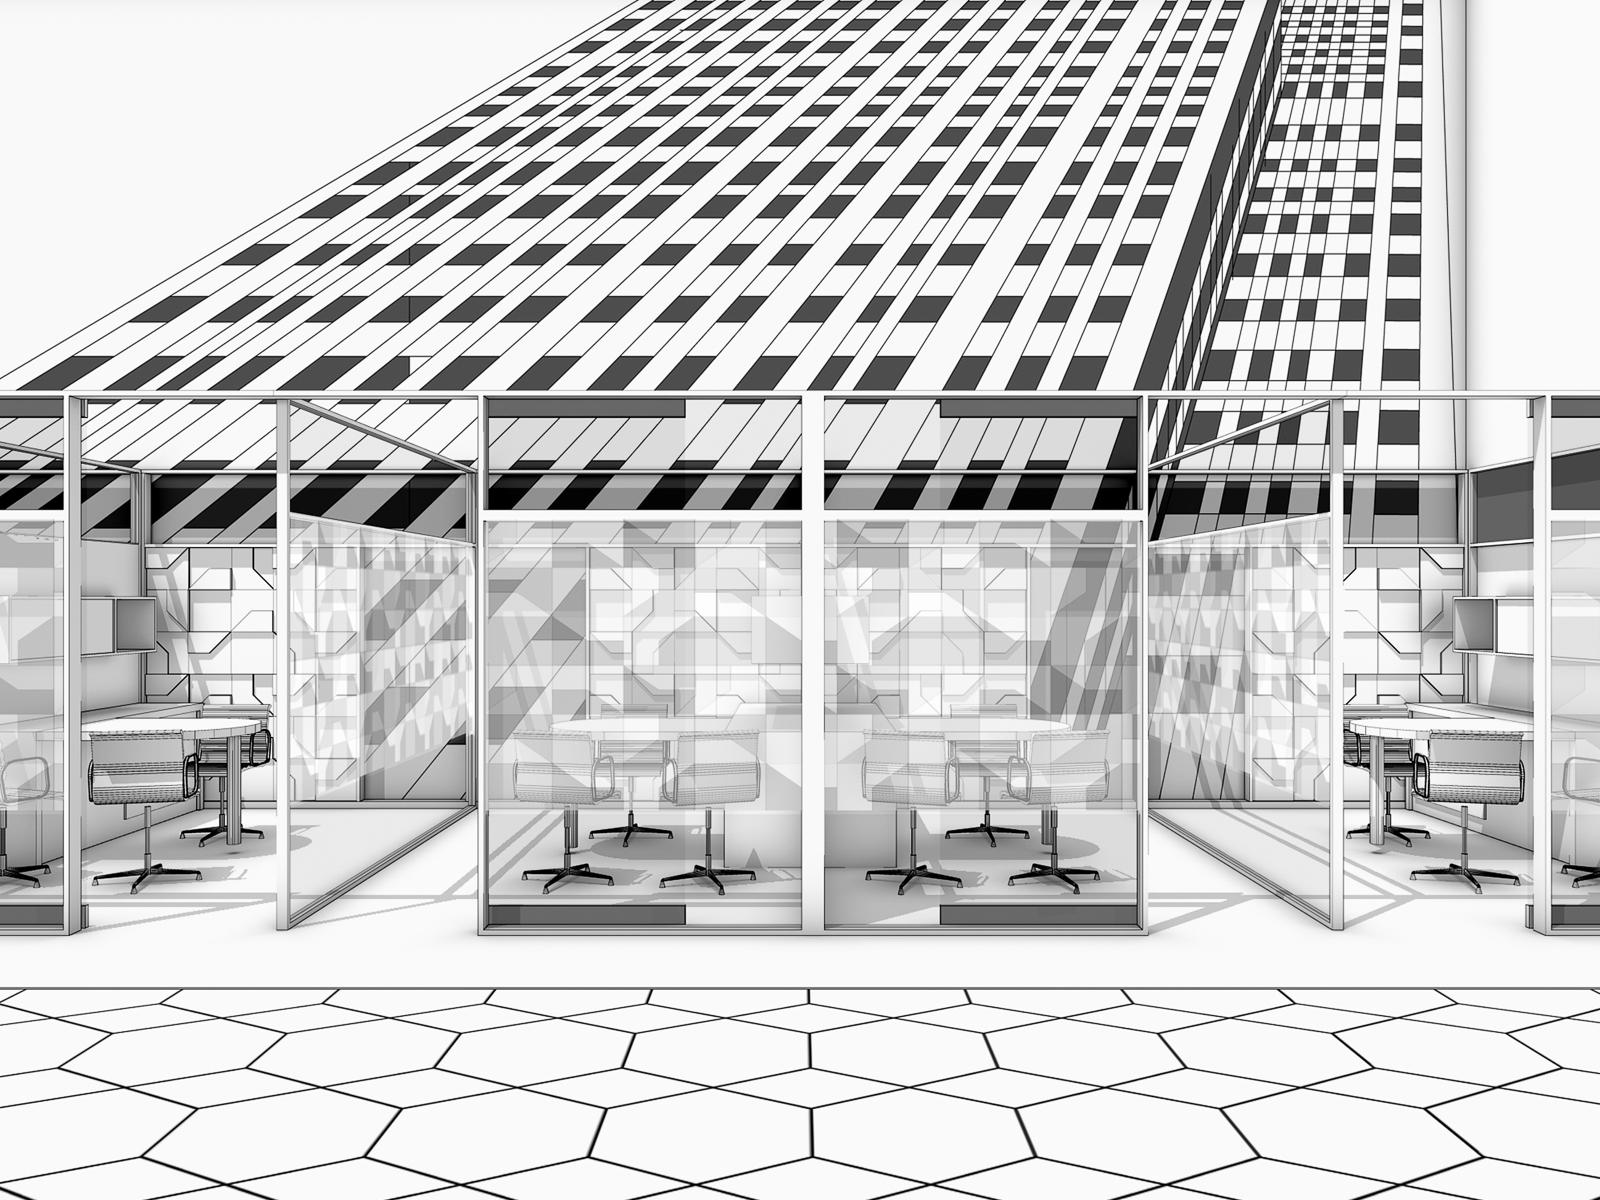 Chase - Rockefeller - cam6 Interior Perspective (18x24)